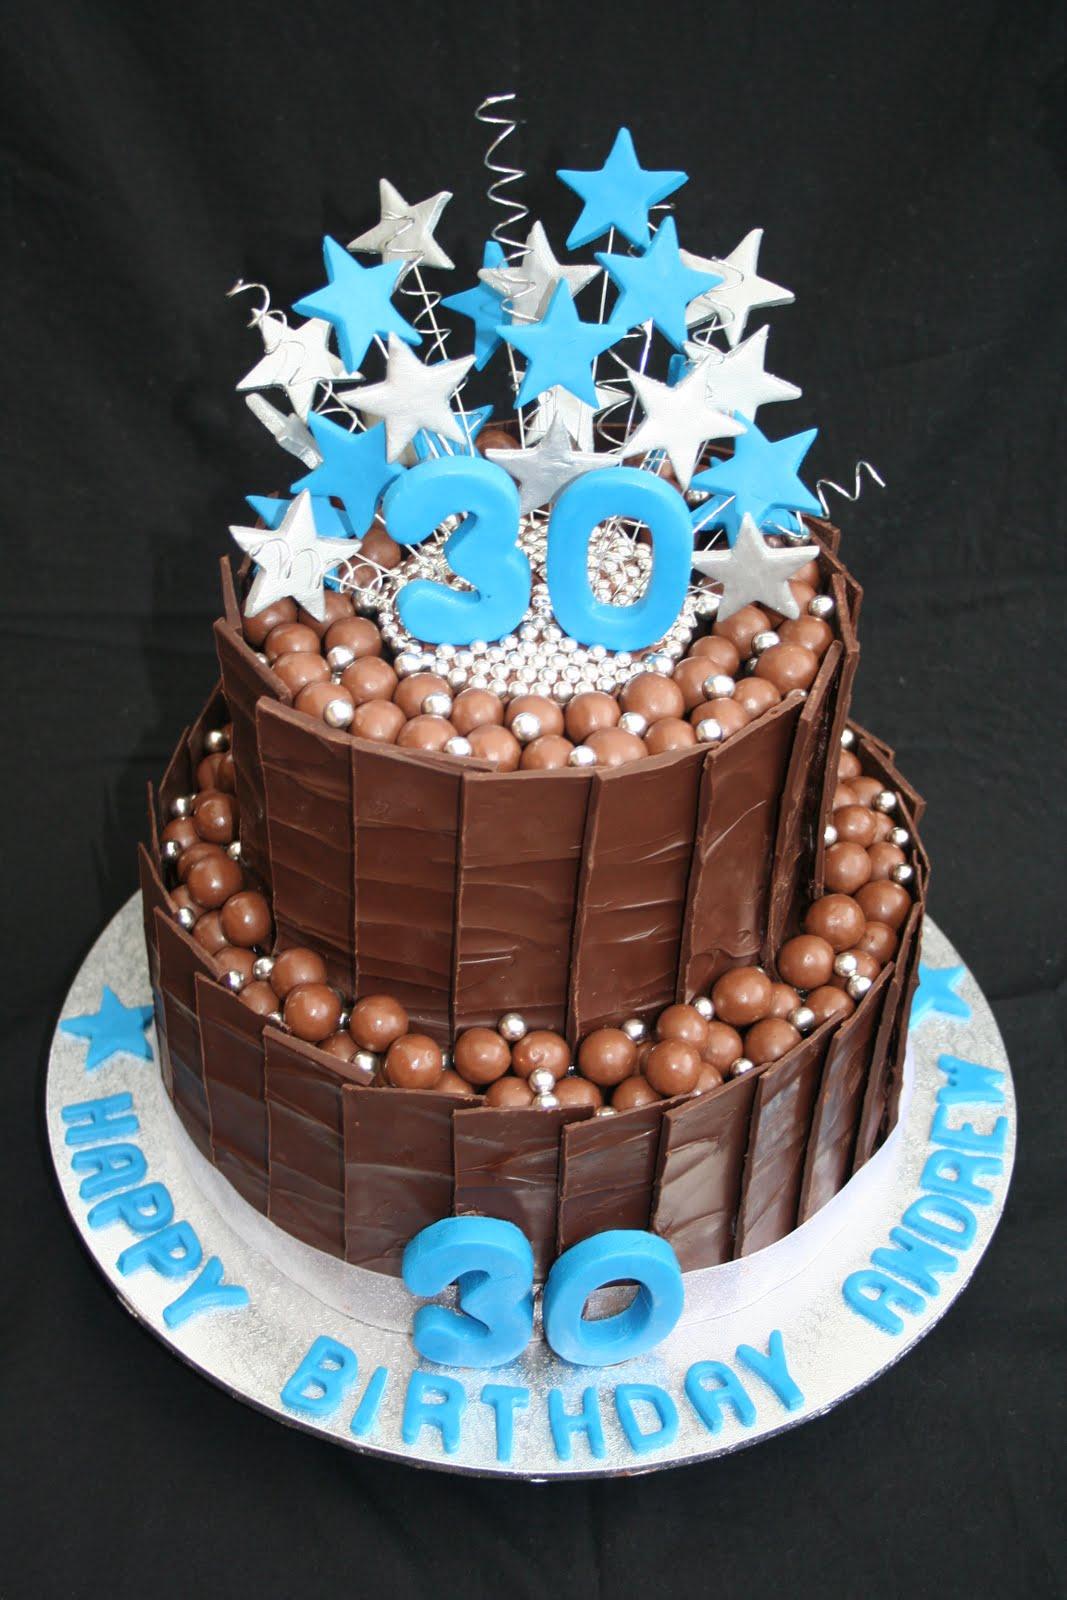 Peachy 11 30Th Birthday Cakes For Guys Photo 30Th Birthday Cake Ideas Personalised Birthday Cards Paralily Jamesorg